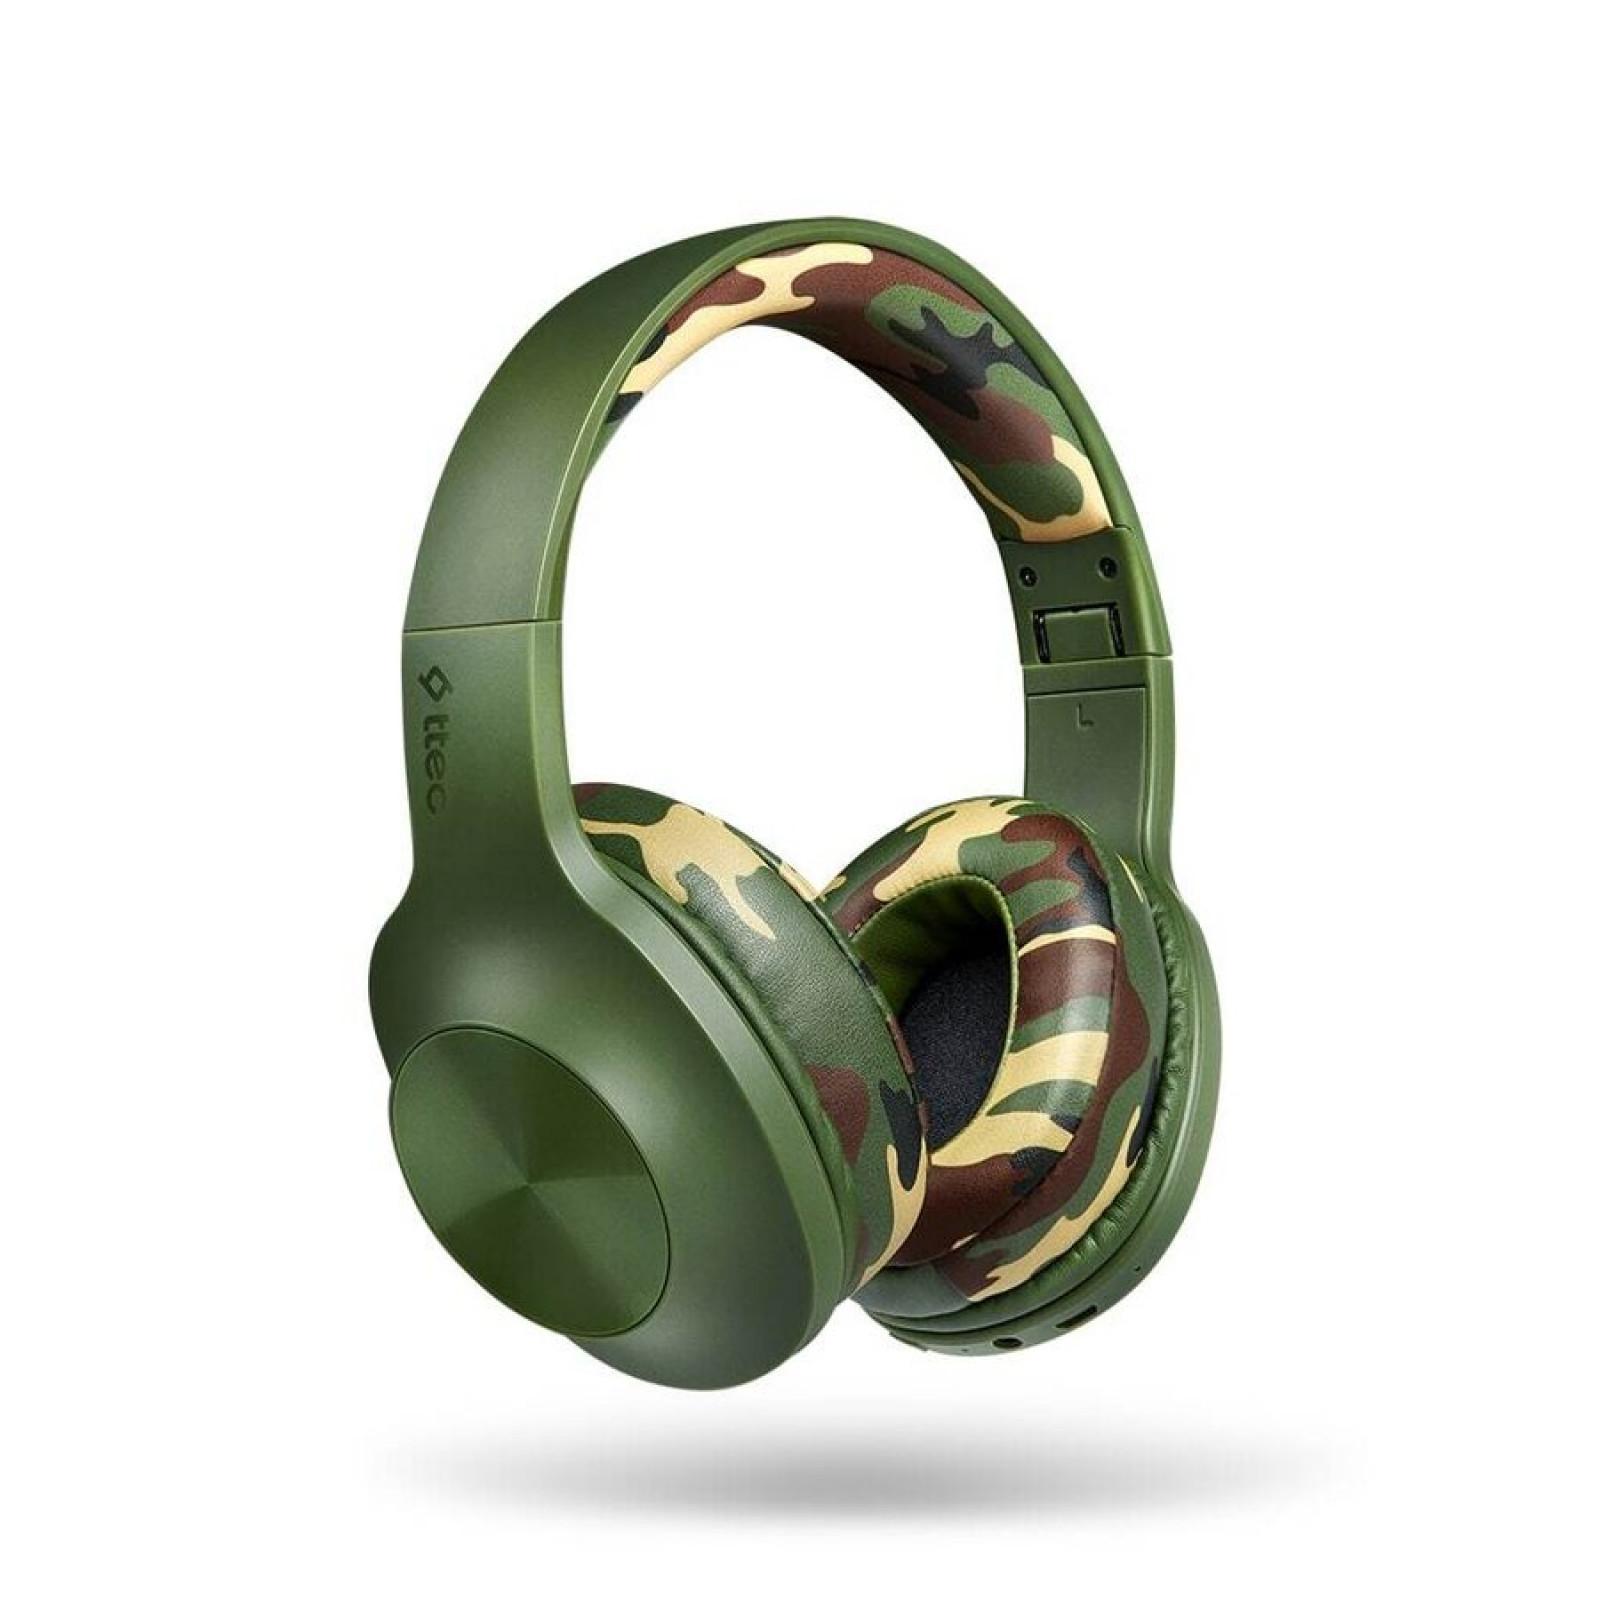 Bluetooth Слушалки ttec SoundMax 2 Wireless BT Stereo Headset - Green Camouflage, 117954